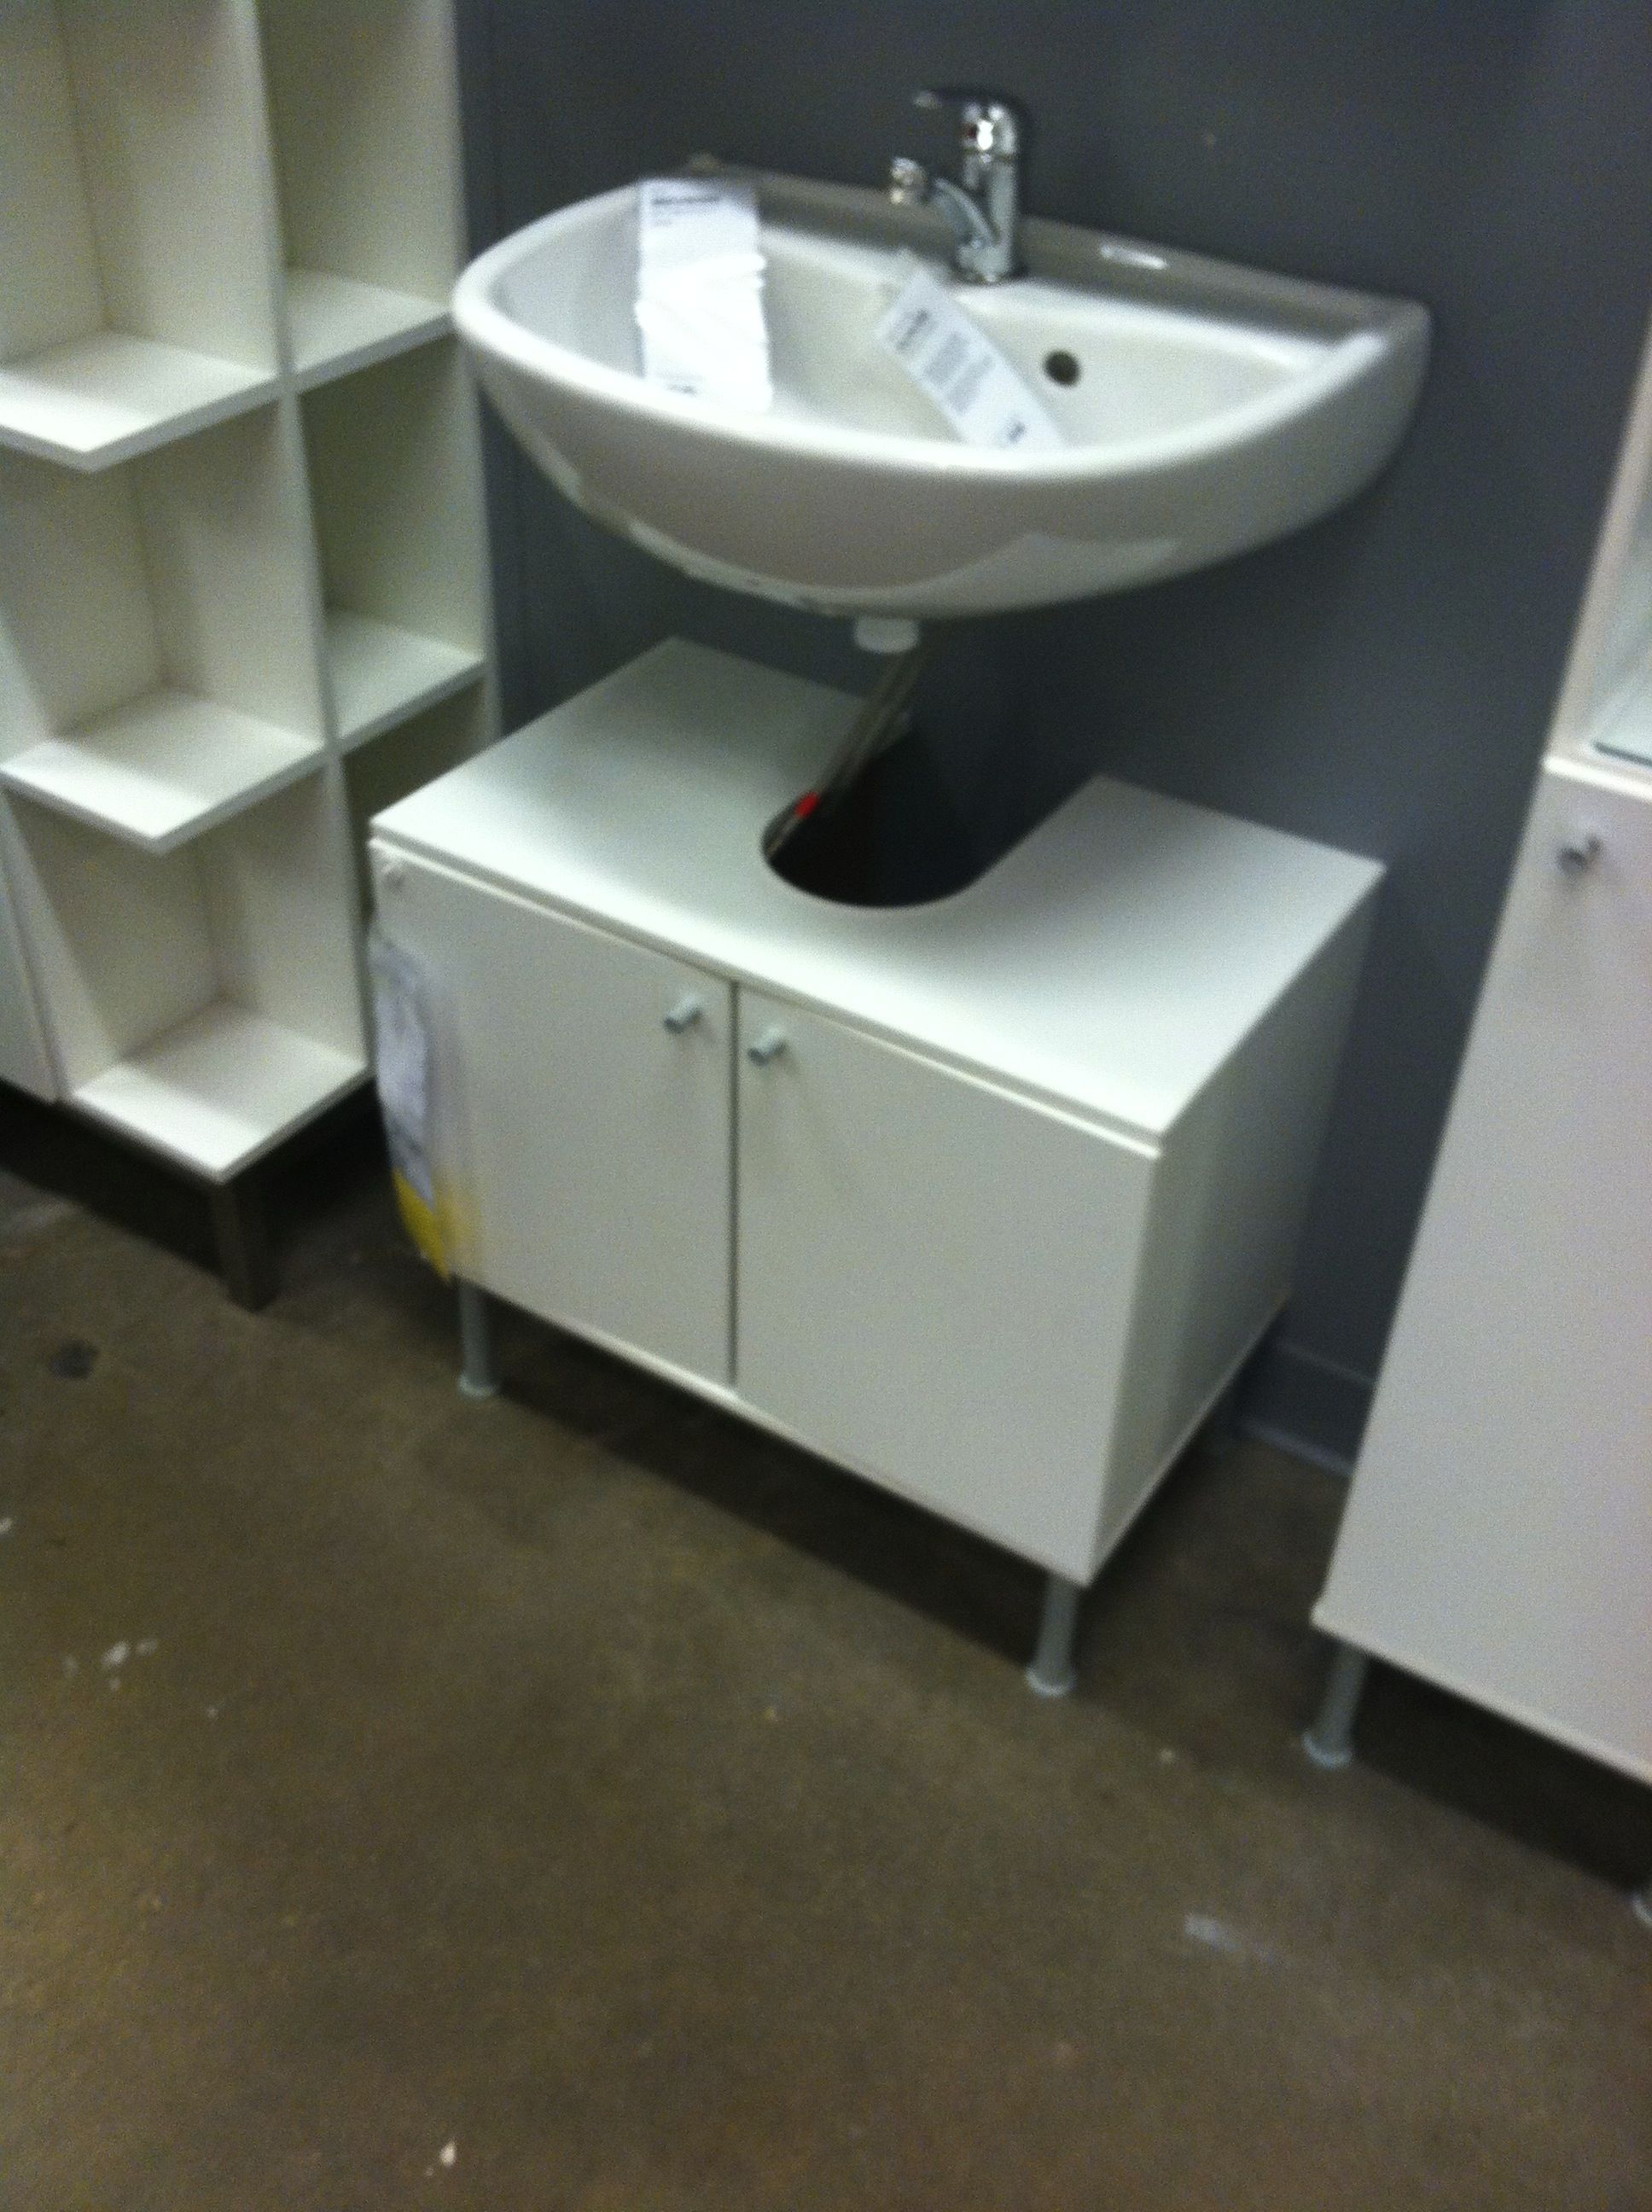 Hide Pipes Under Open Bathroom Sink Ikea Open Bathroom Hide